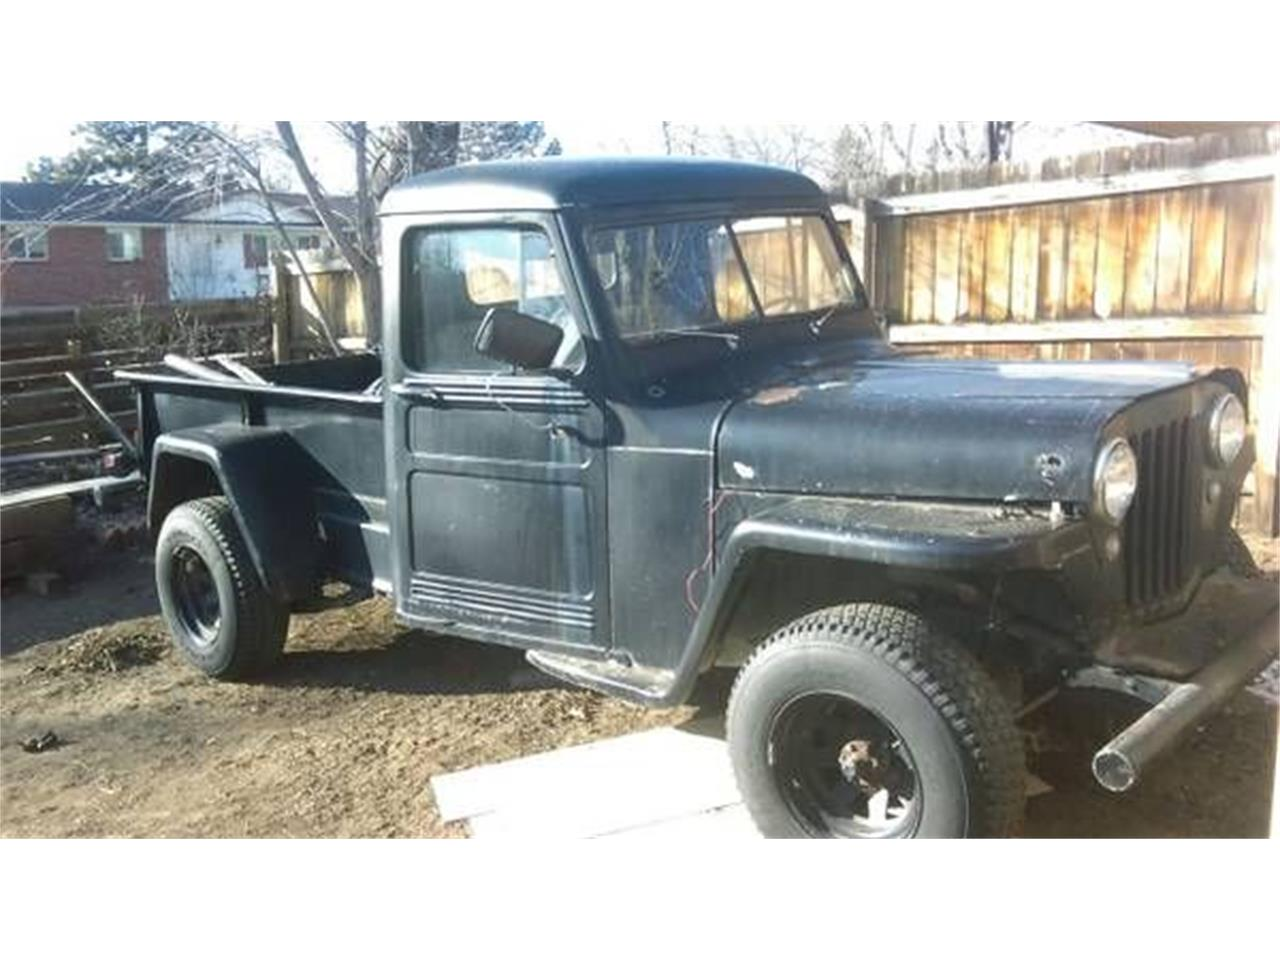 Willys Jeep For Sale >> 1952 Willys Jeep For Sale In Cadillac Mi Classiccarsbay Com